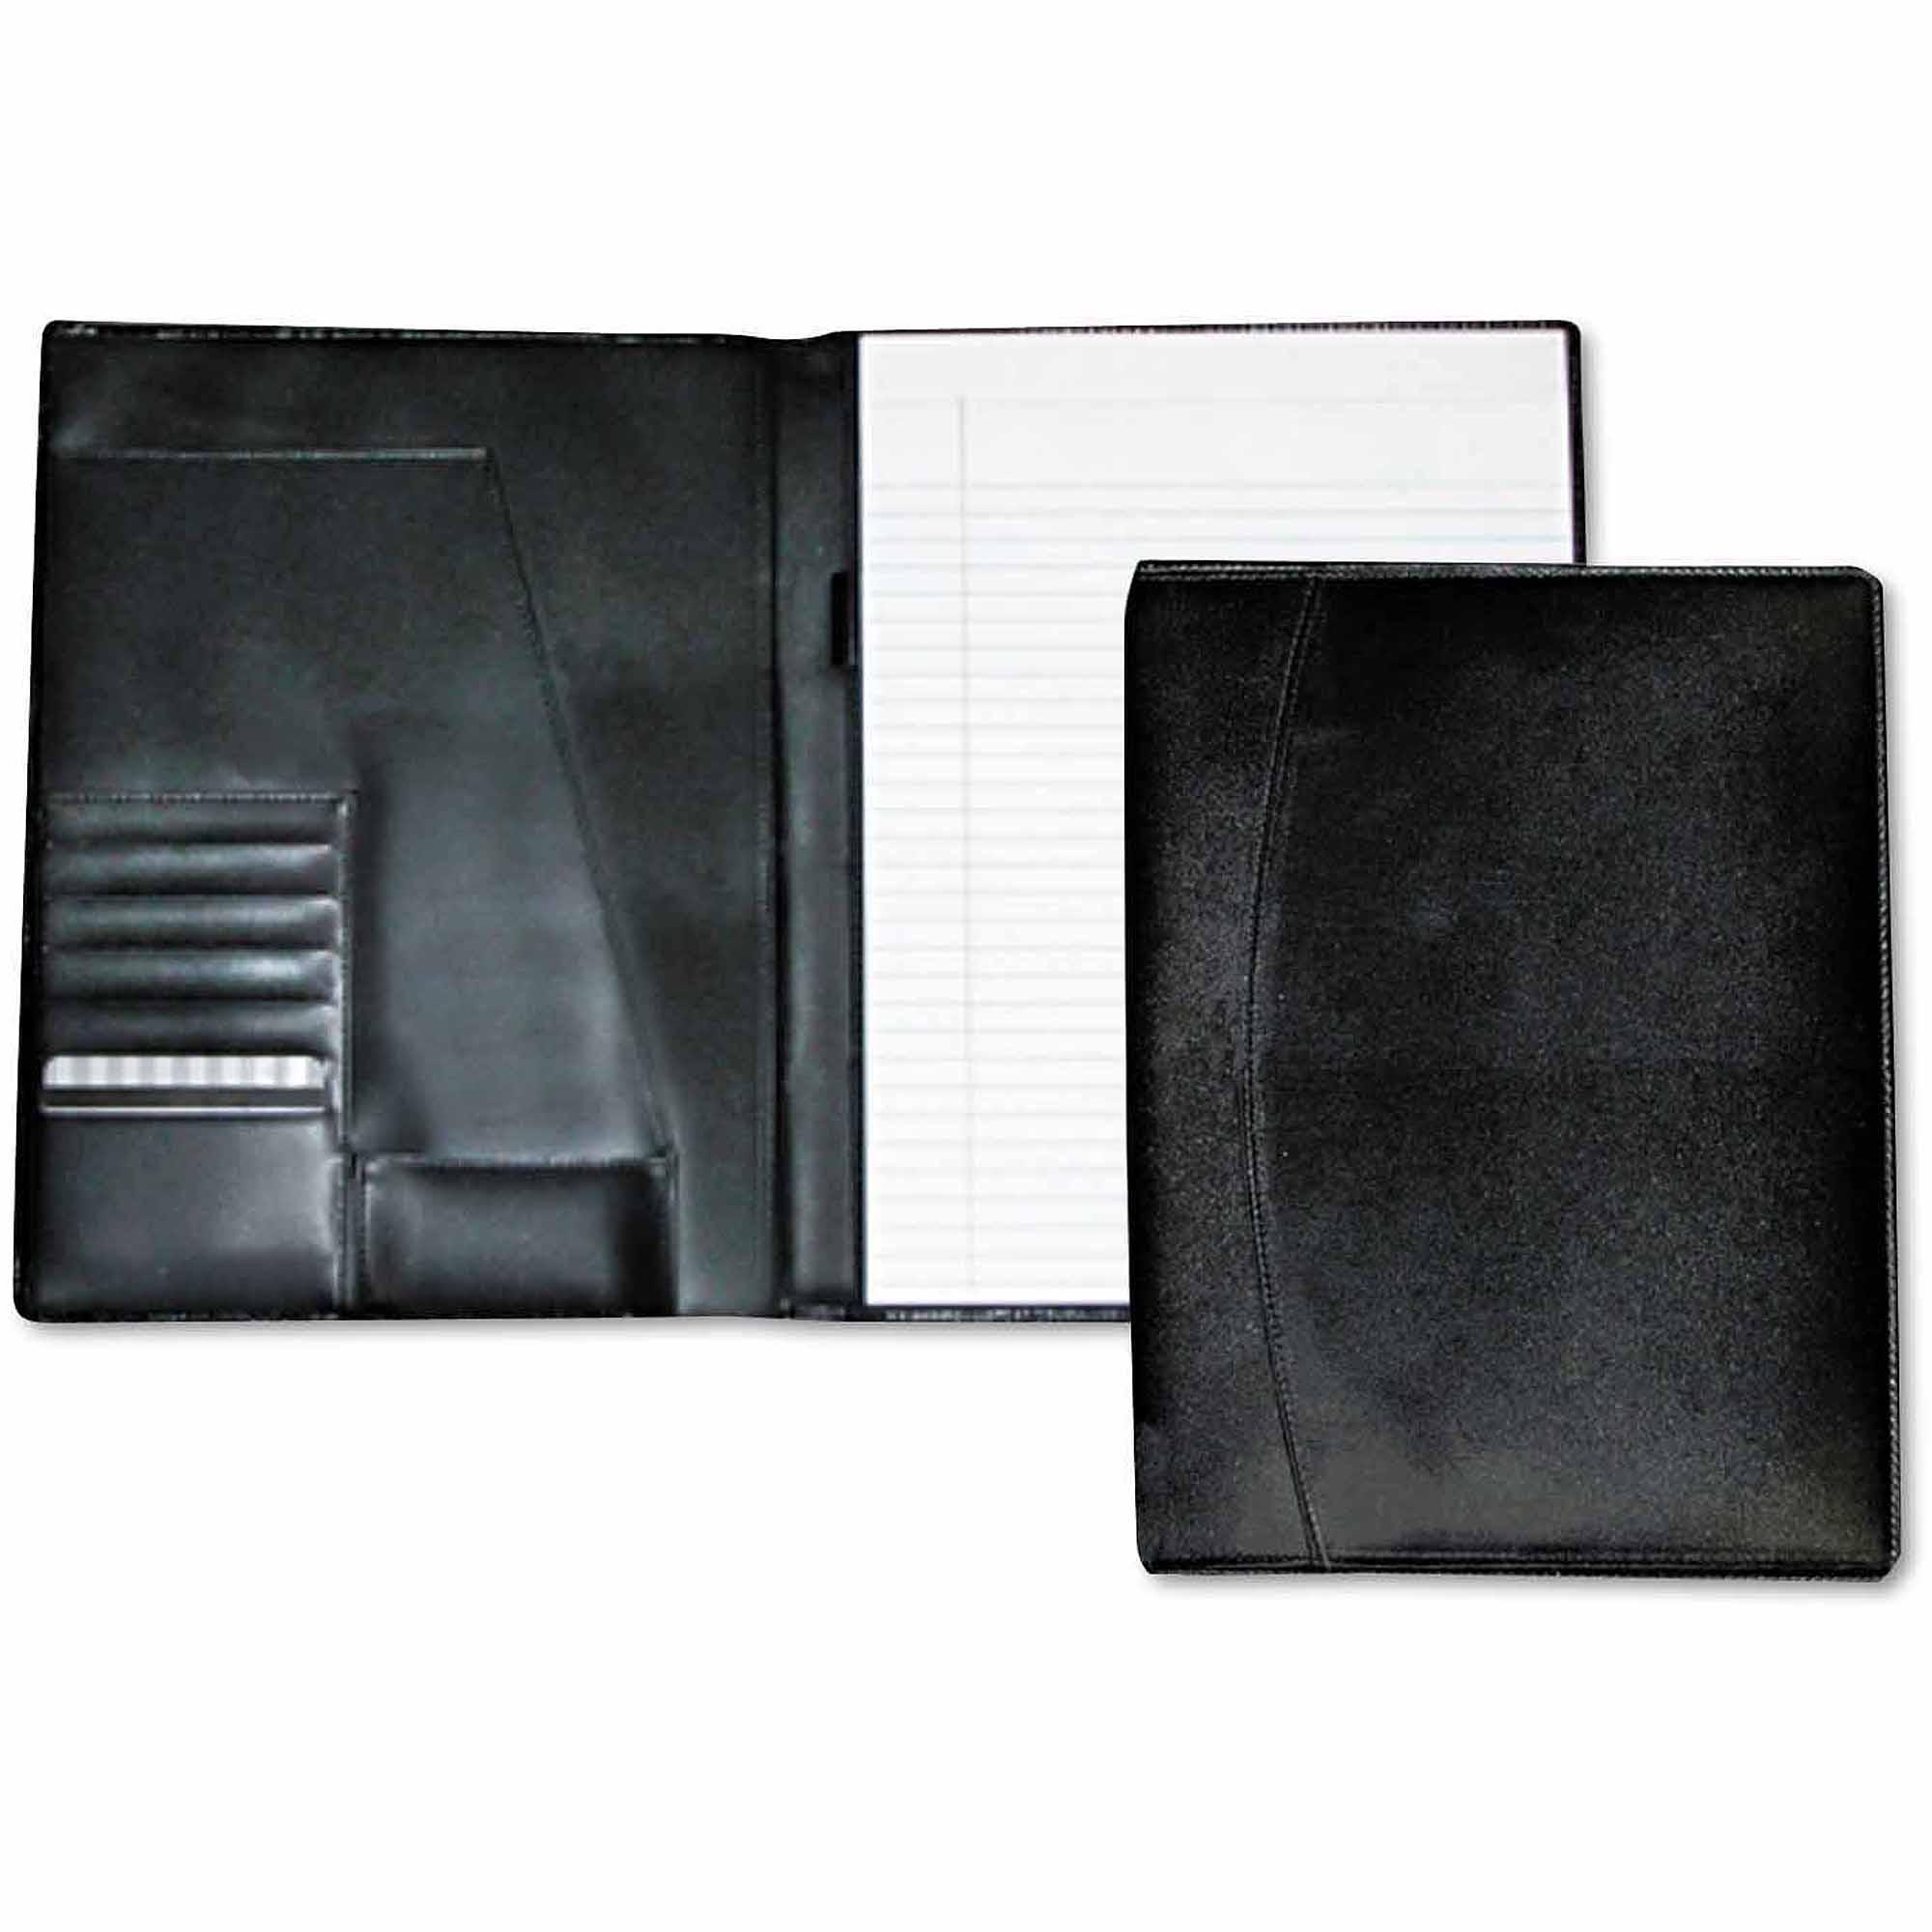 "Buxton Men's Classic Pad Folio/Writing Pad, 8-1/2"" x 11"", Black"